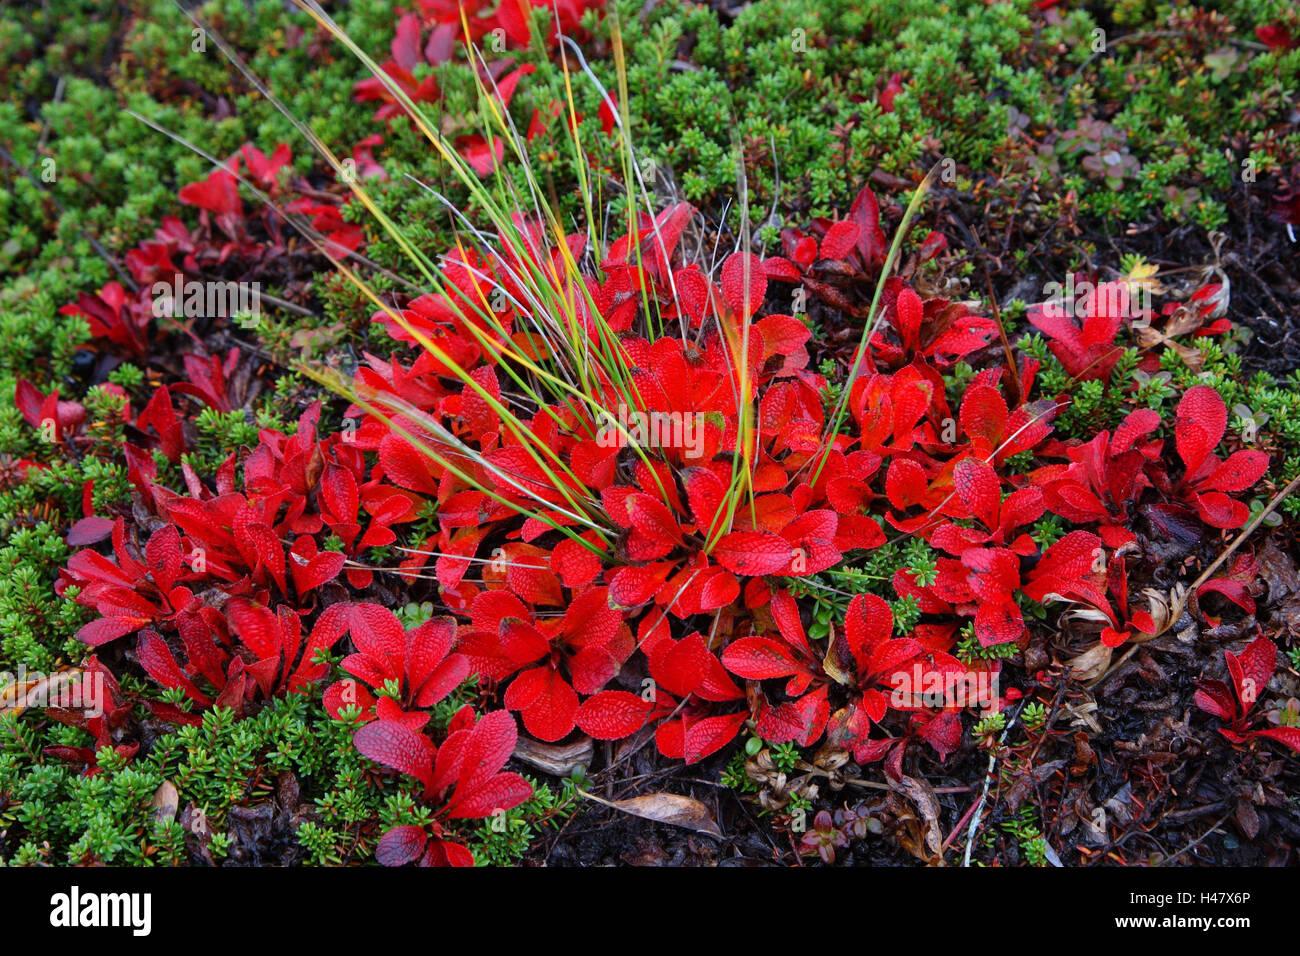 Wald Boden Pflanzen Blatter Alpen Bar Traube Herbst Stockfoto